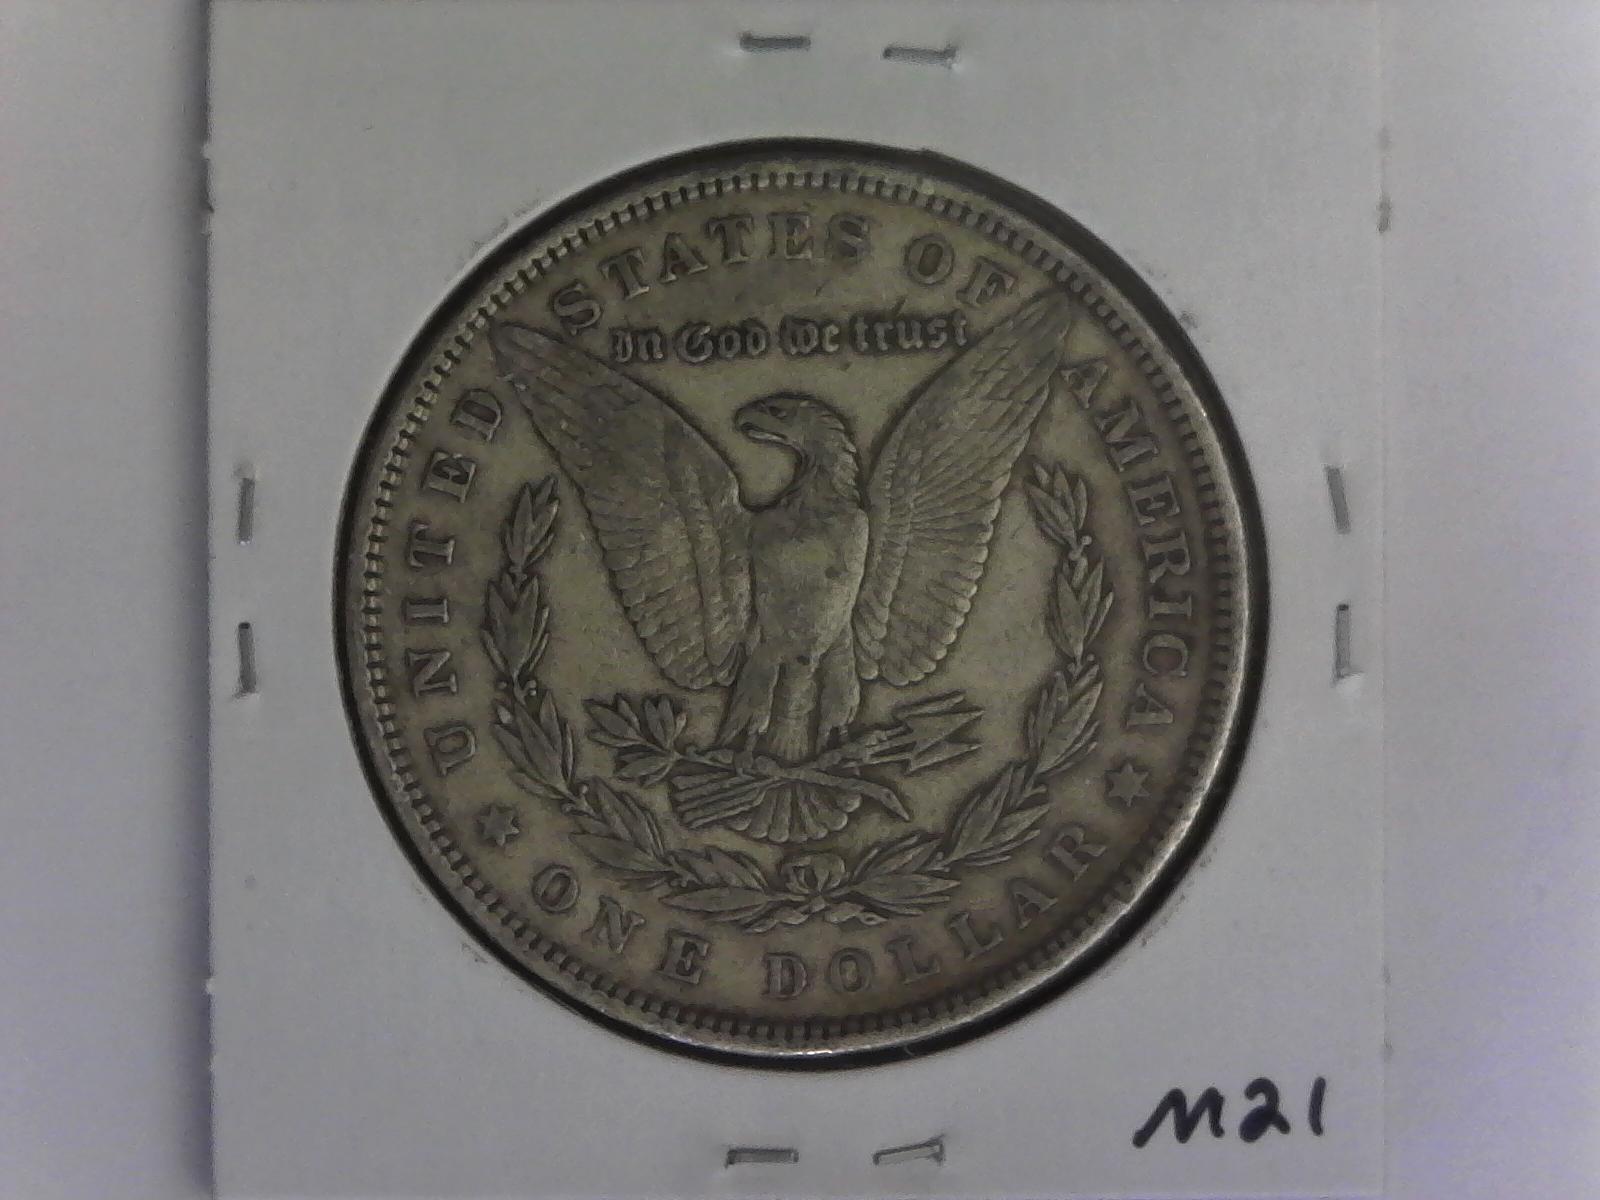 https://0201.nccdn.net/1_2/000/000/0f2/908/M21-1884-rev.jpg